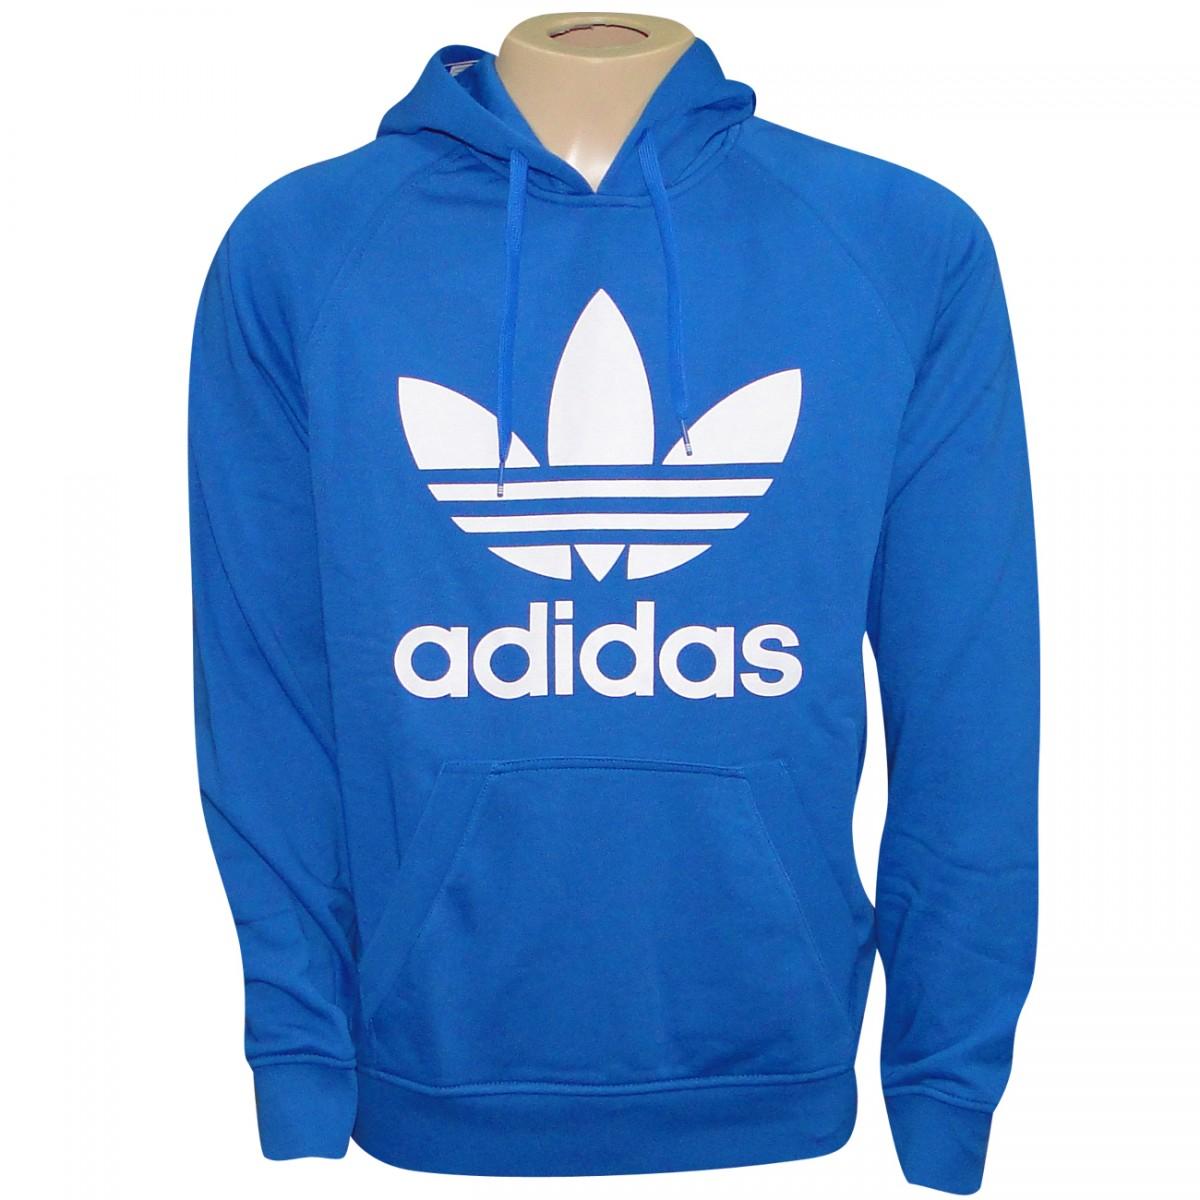 87d23861964 Moletom Adidas Originals Tref Hoody S23123 - Royal Branco - Chuteira Nike